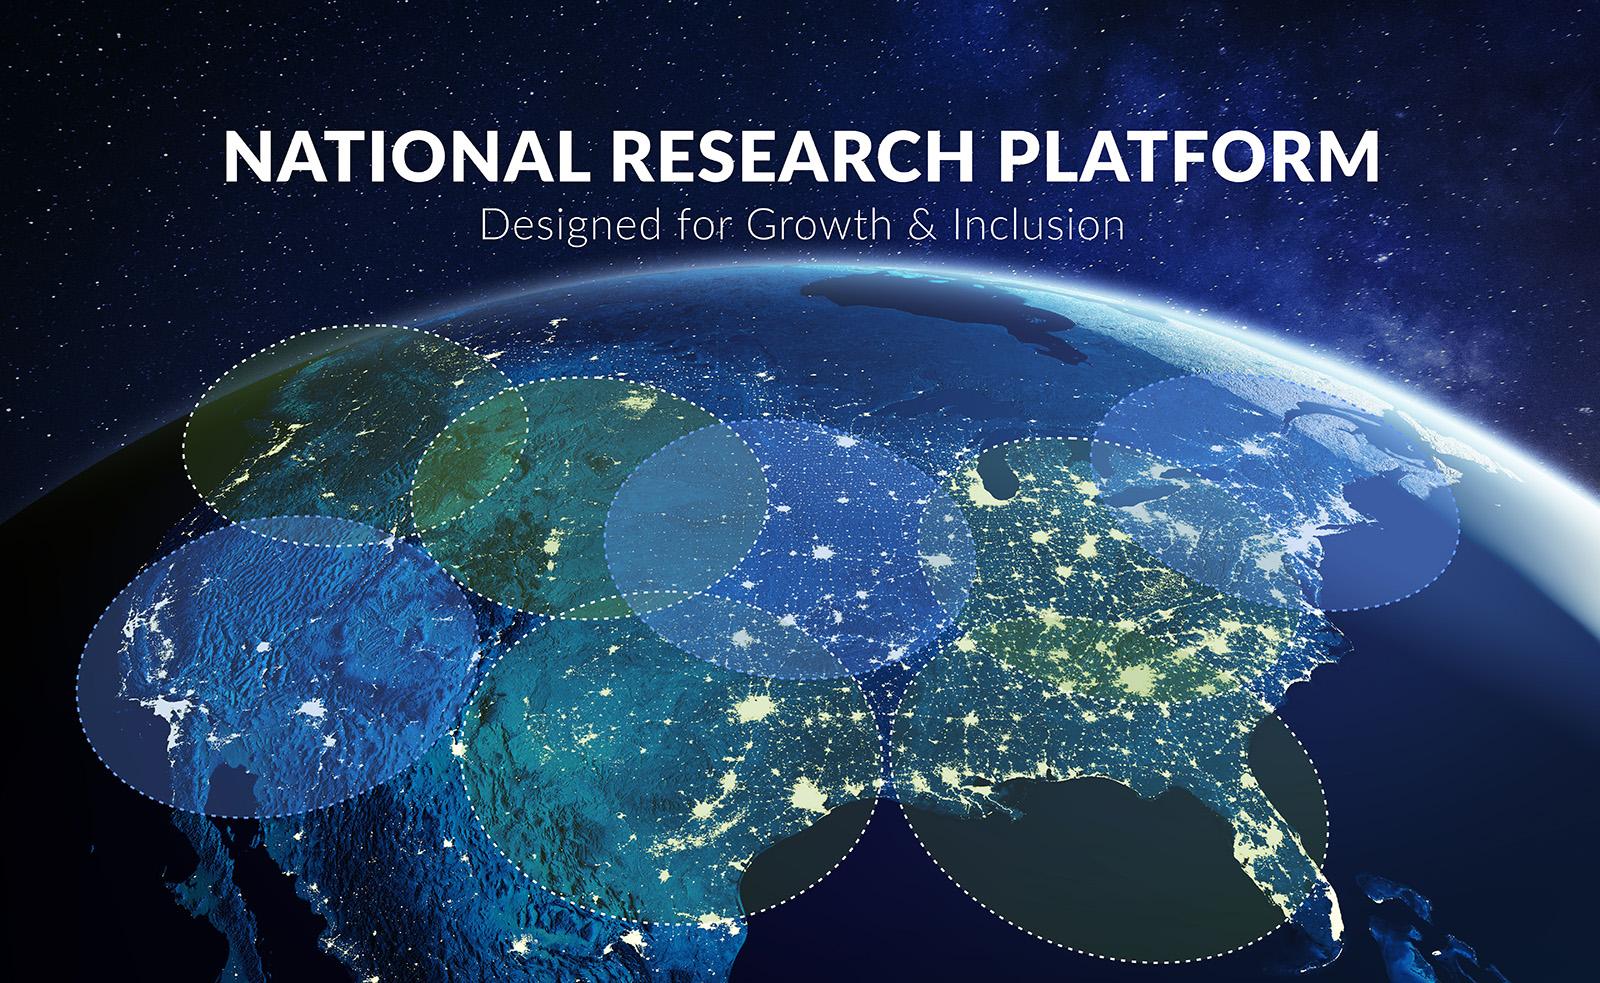 National Research Platform